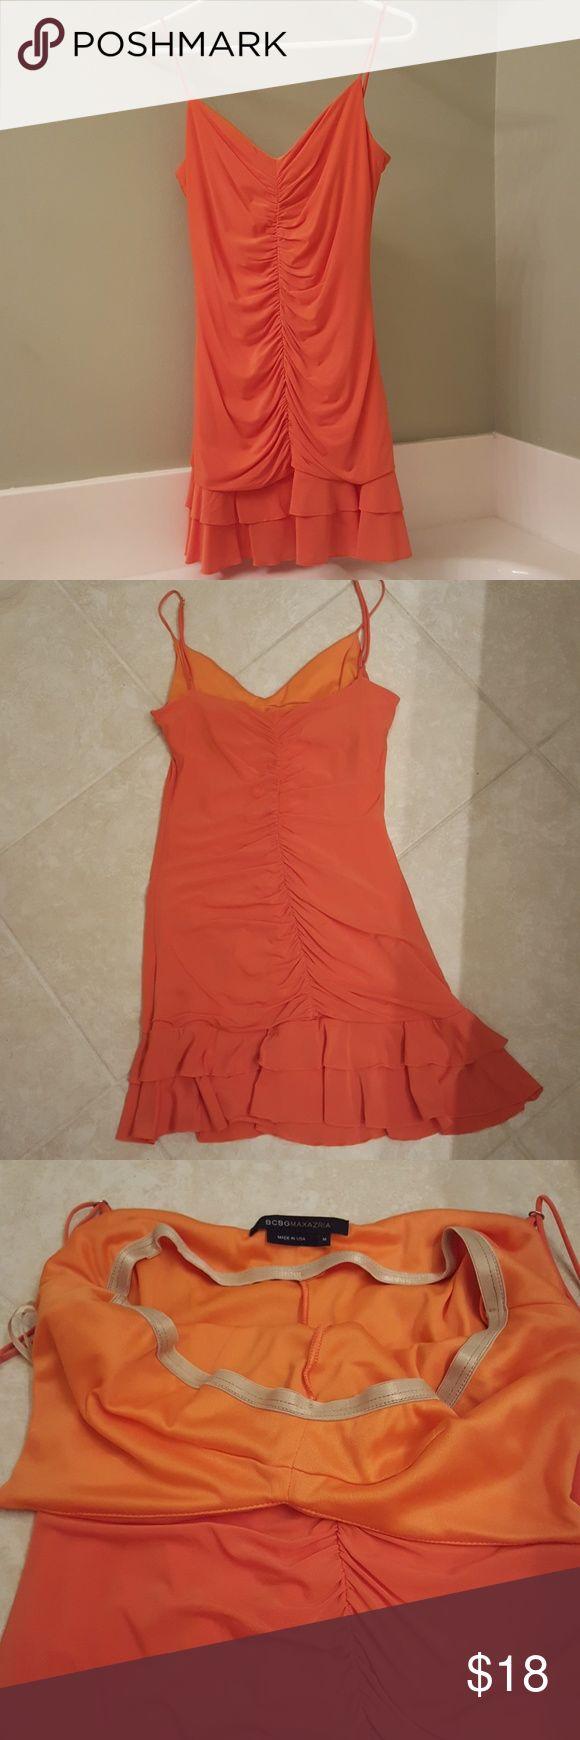 BCBGMaxAzria Orange Mini Dress BCBGMaxAzria Orange Mini Dress with very unnoticeable stain on back of dress skirt. See last picture. Price reflects the flaw. Offers welcome. BCBGMaxAzria Dresses Mini